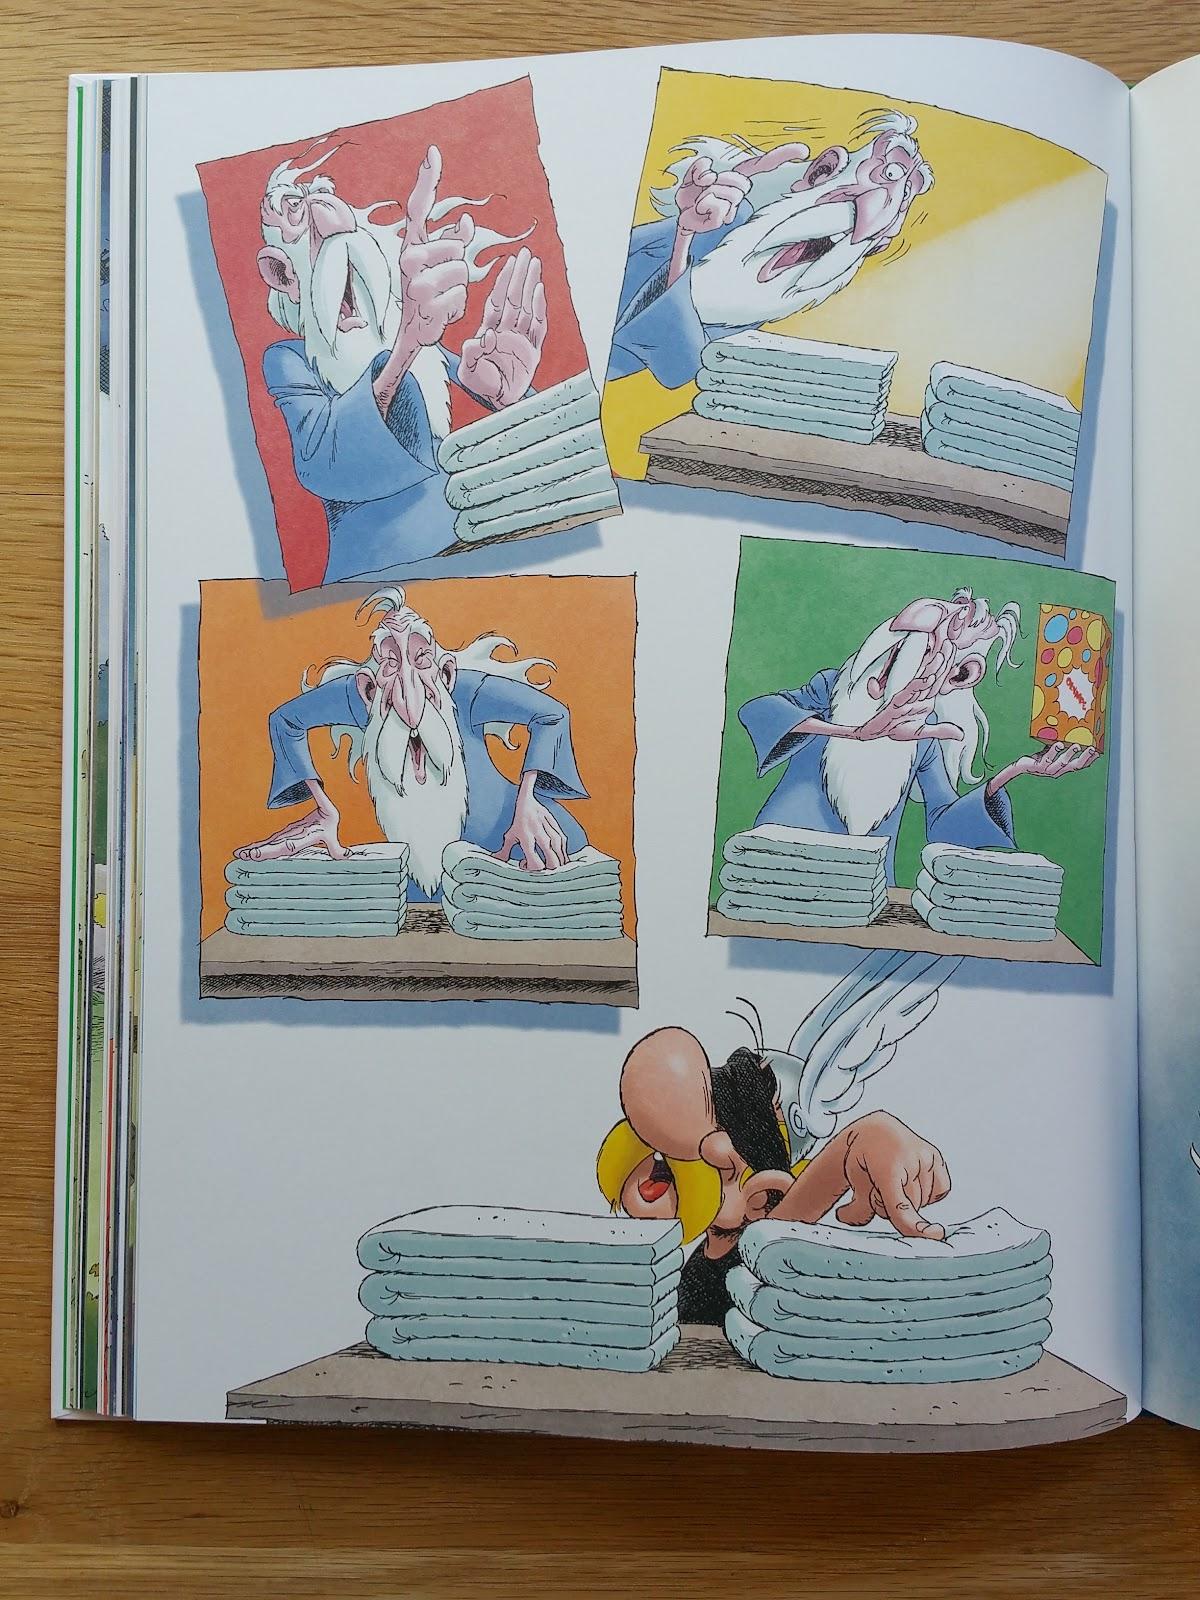 Astérix Les 12 travaux dAstérix Albert Uderzo René Goscinny